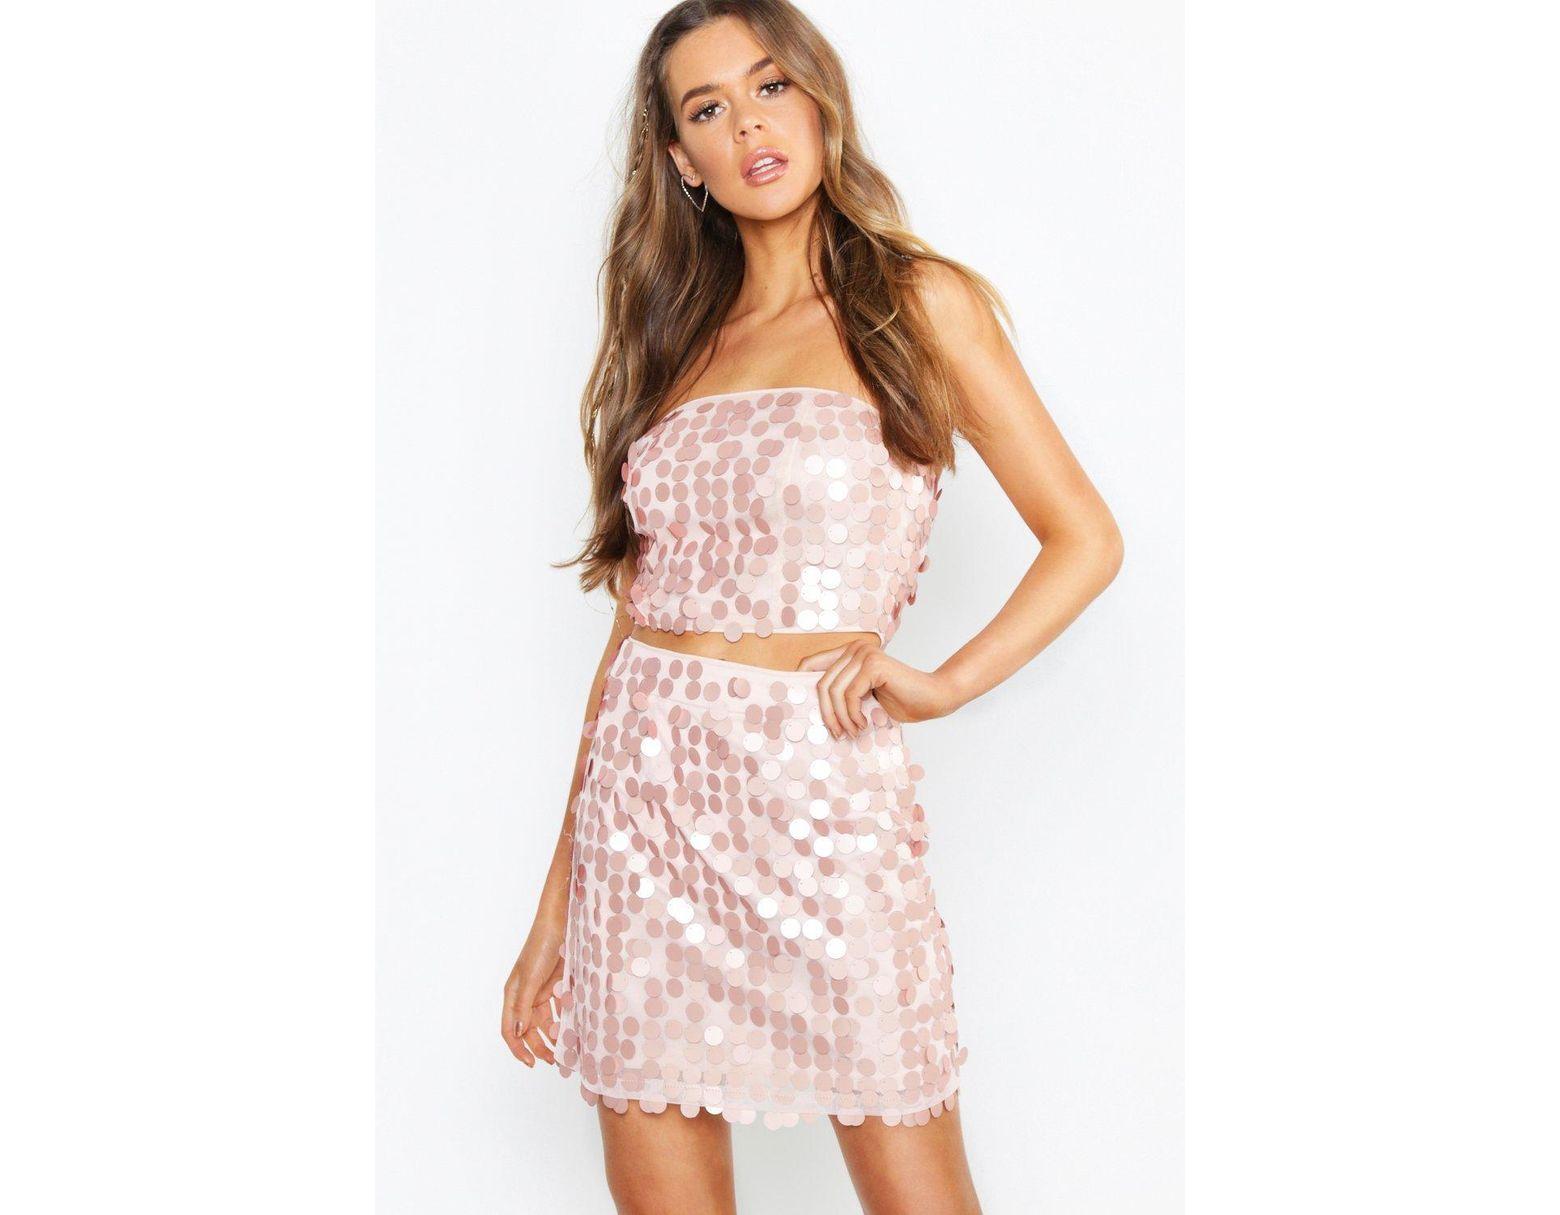 037cfcd1b261 Boohoo Sequin Bralet + Mini Skirt Co-ord - Lyst